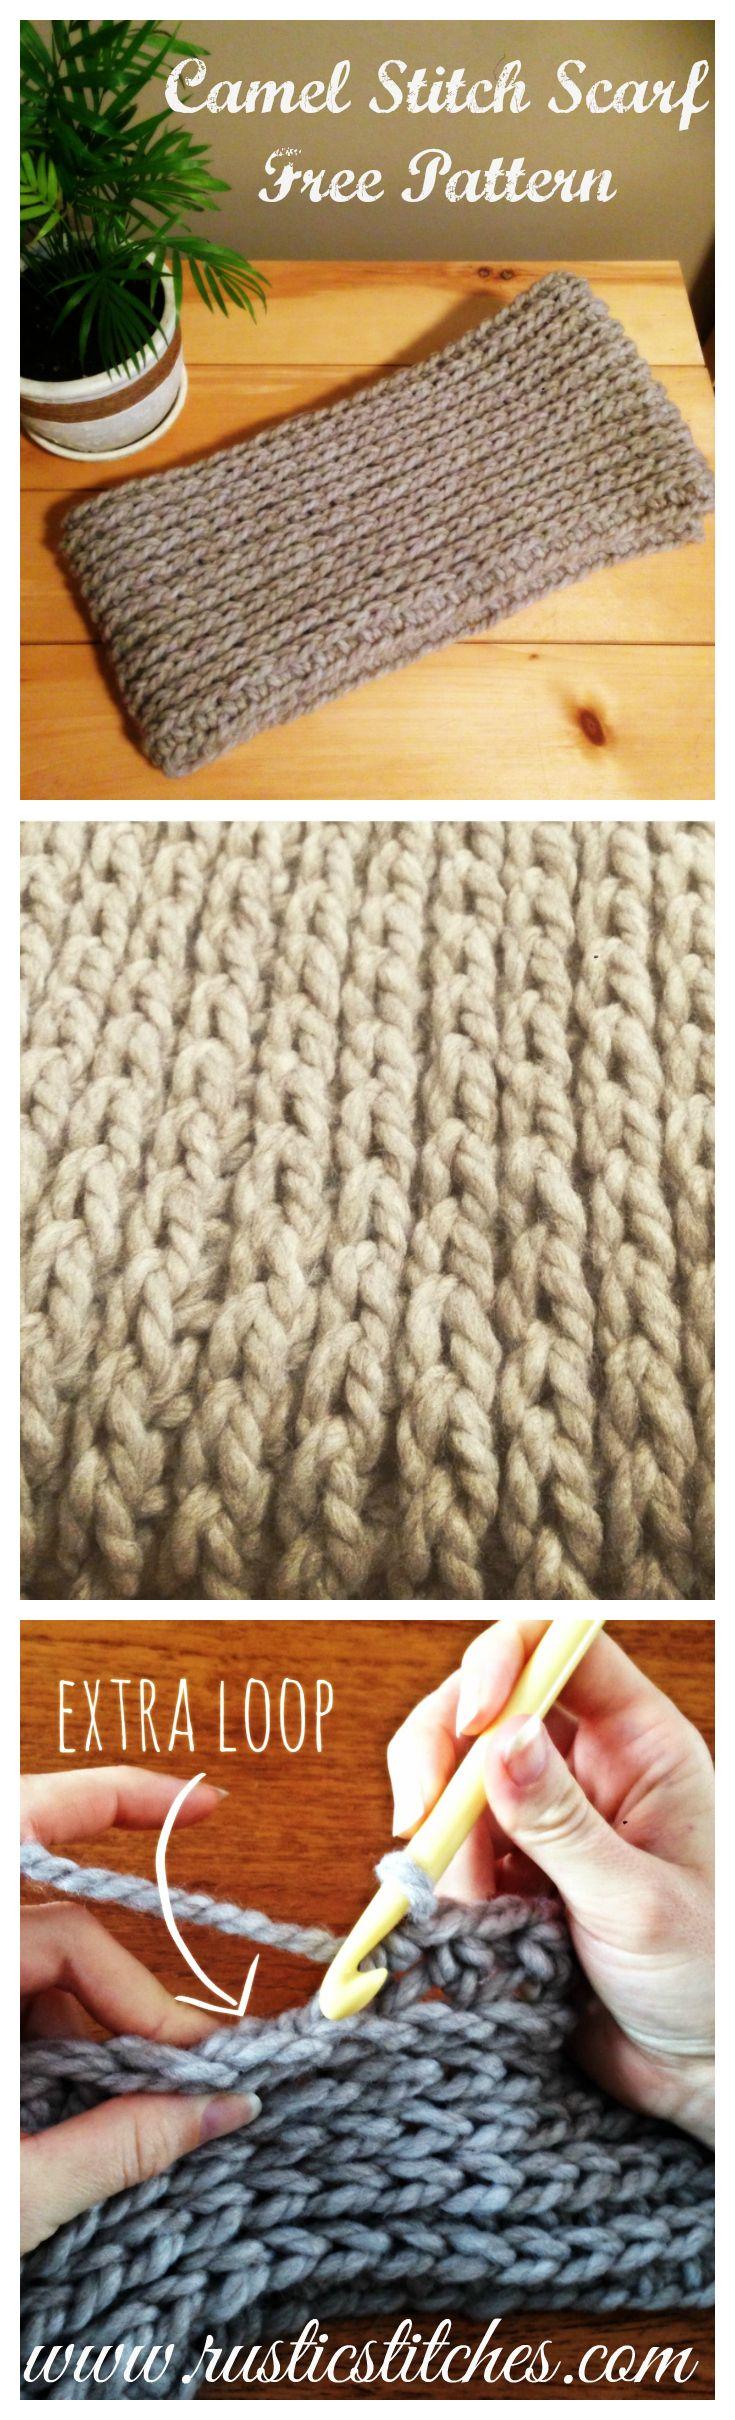 Best 25 infinity scarf patterns ideas on pinterest crochet crochet camel stitch infinity scarf free pattern bankloansurffo Images